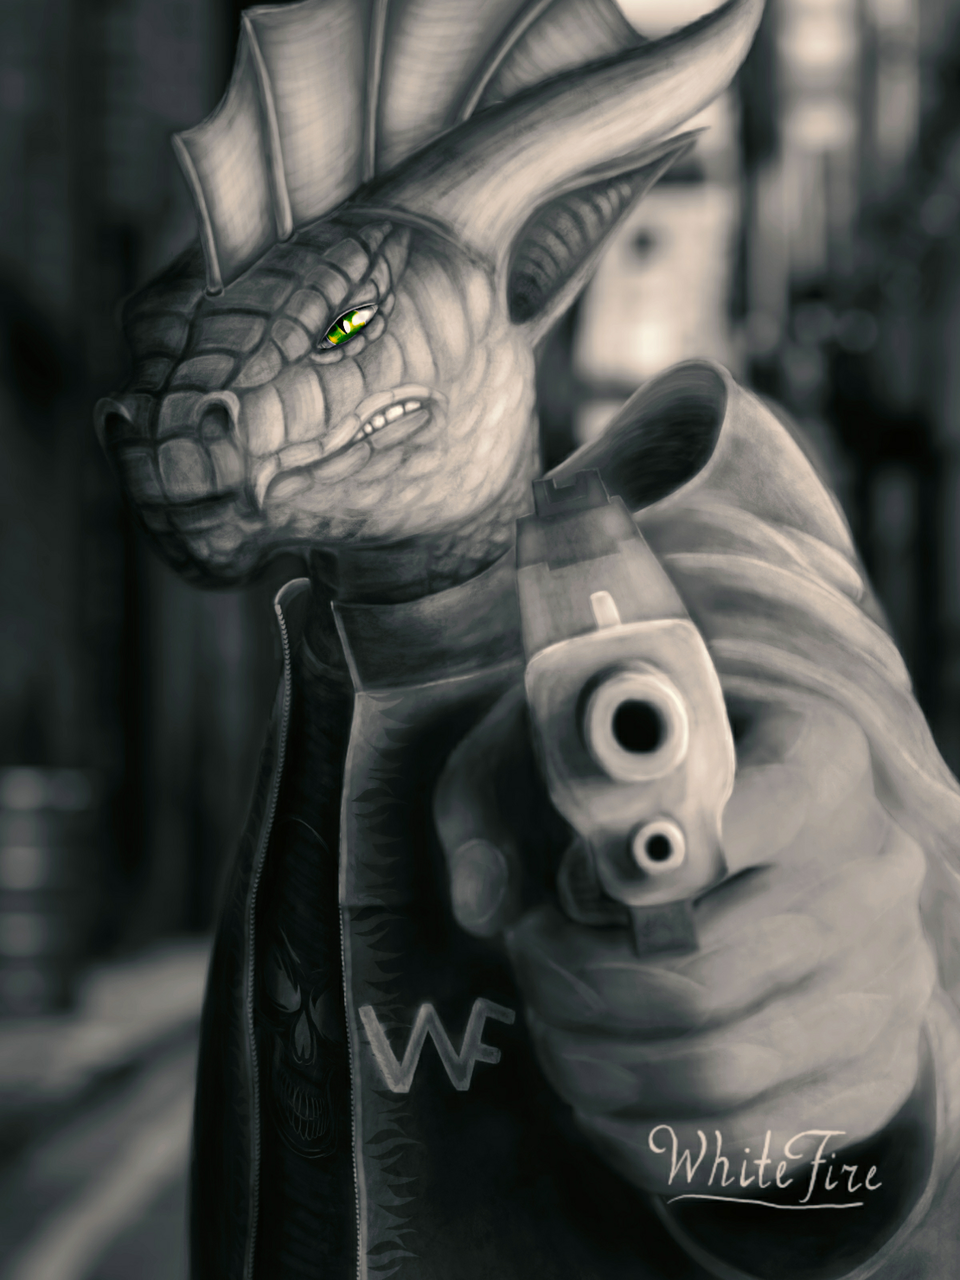 Stone jungle Illust of ℤ𝕖𝕟𝕜𝕒𝕥𝕒𝕣 medibangpaint realistic Street monochrome oc pistol Gun